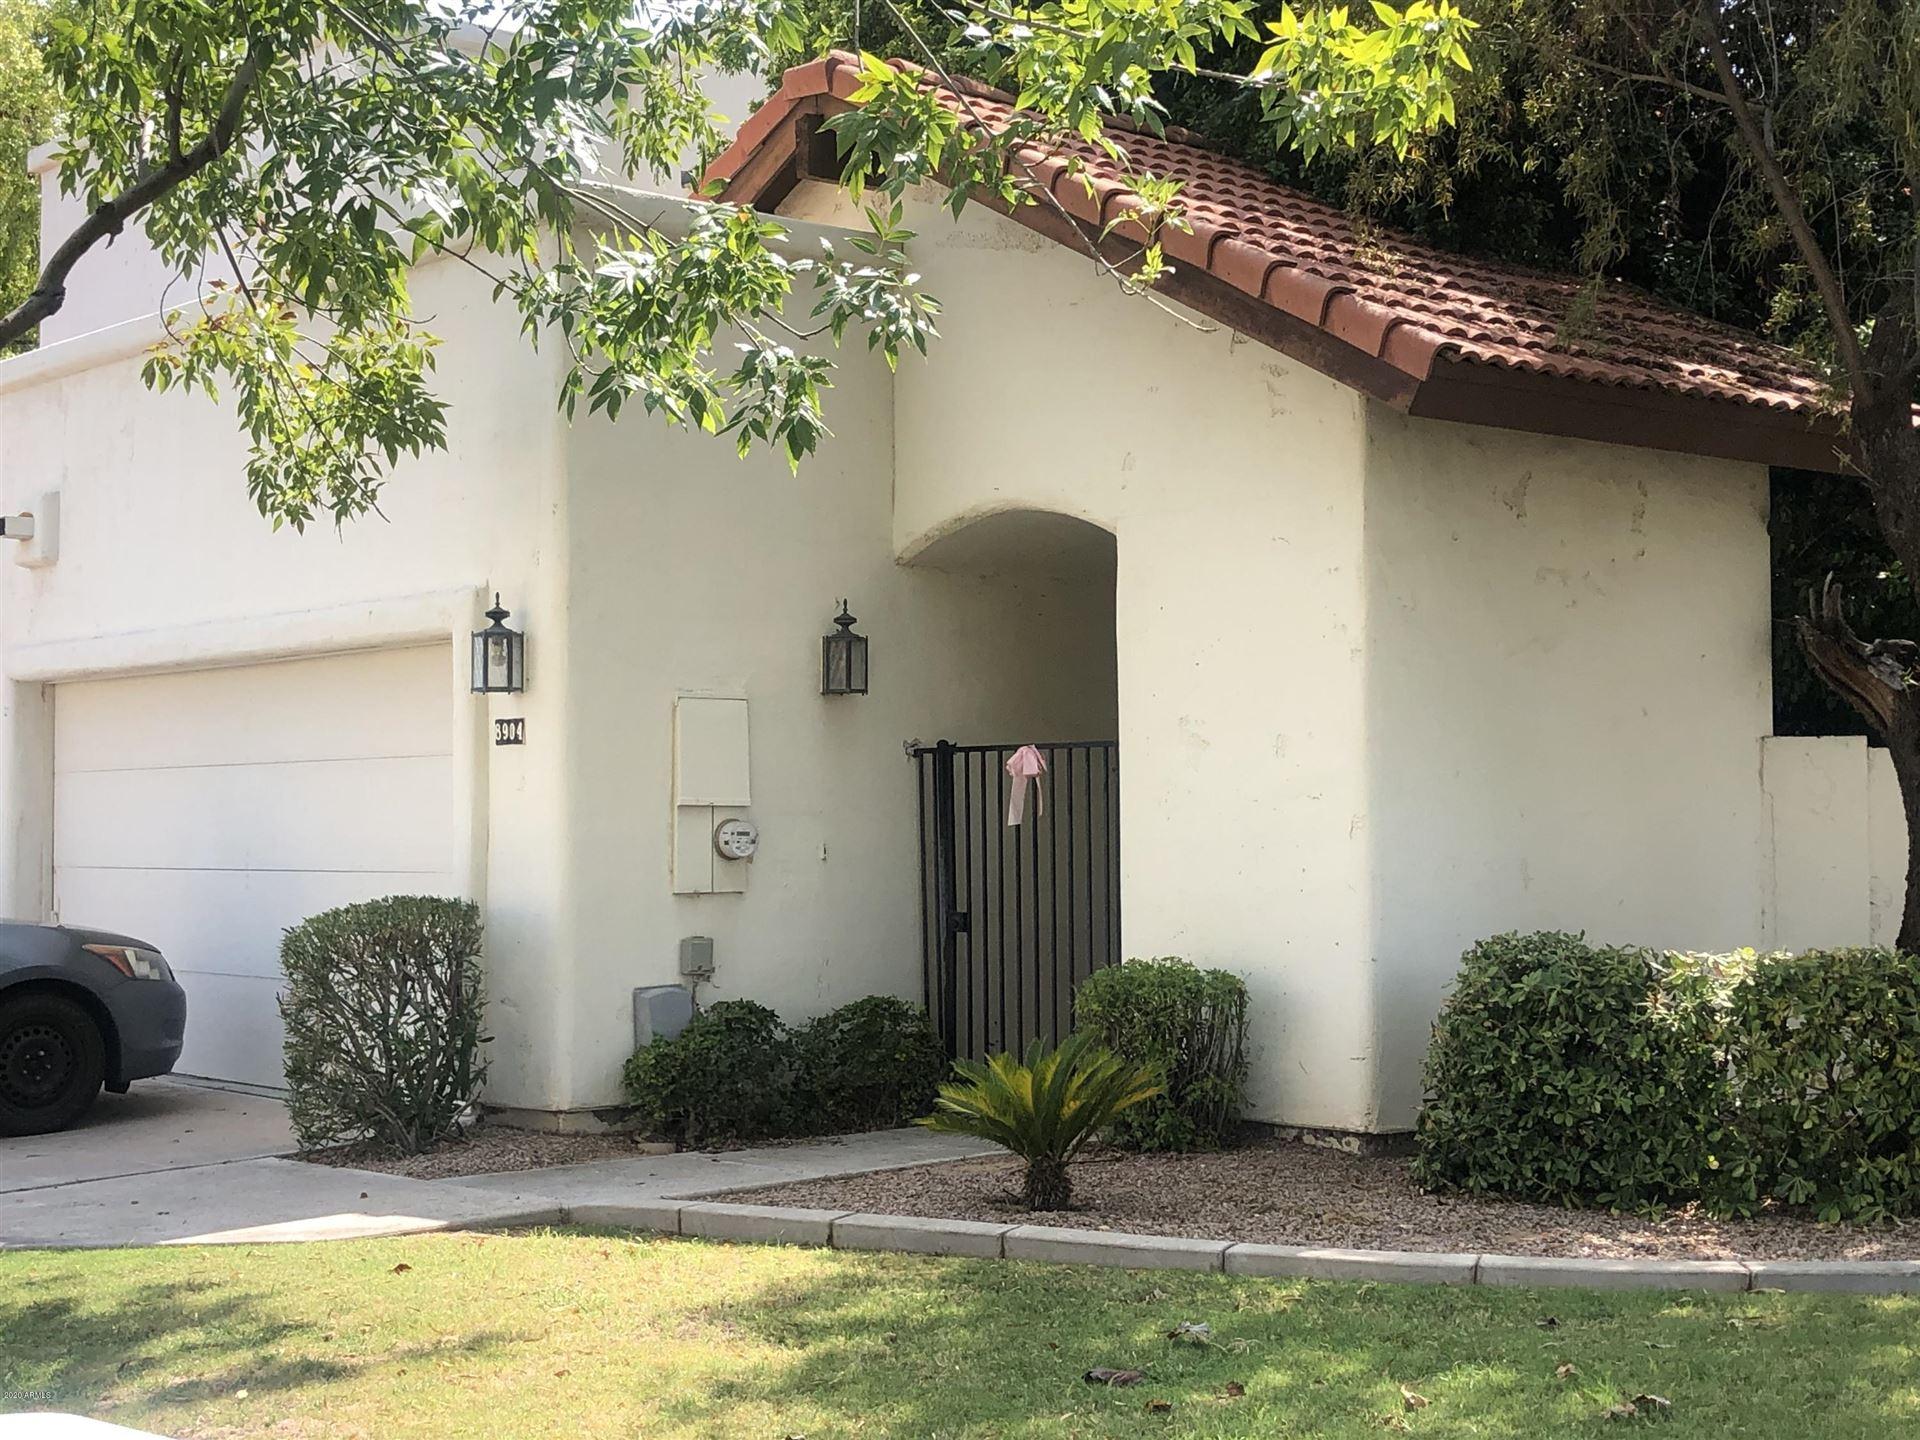 8904 S Heather Drive, Tempe, AZ 85284 - MLS#: 6112274